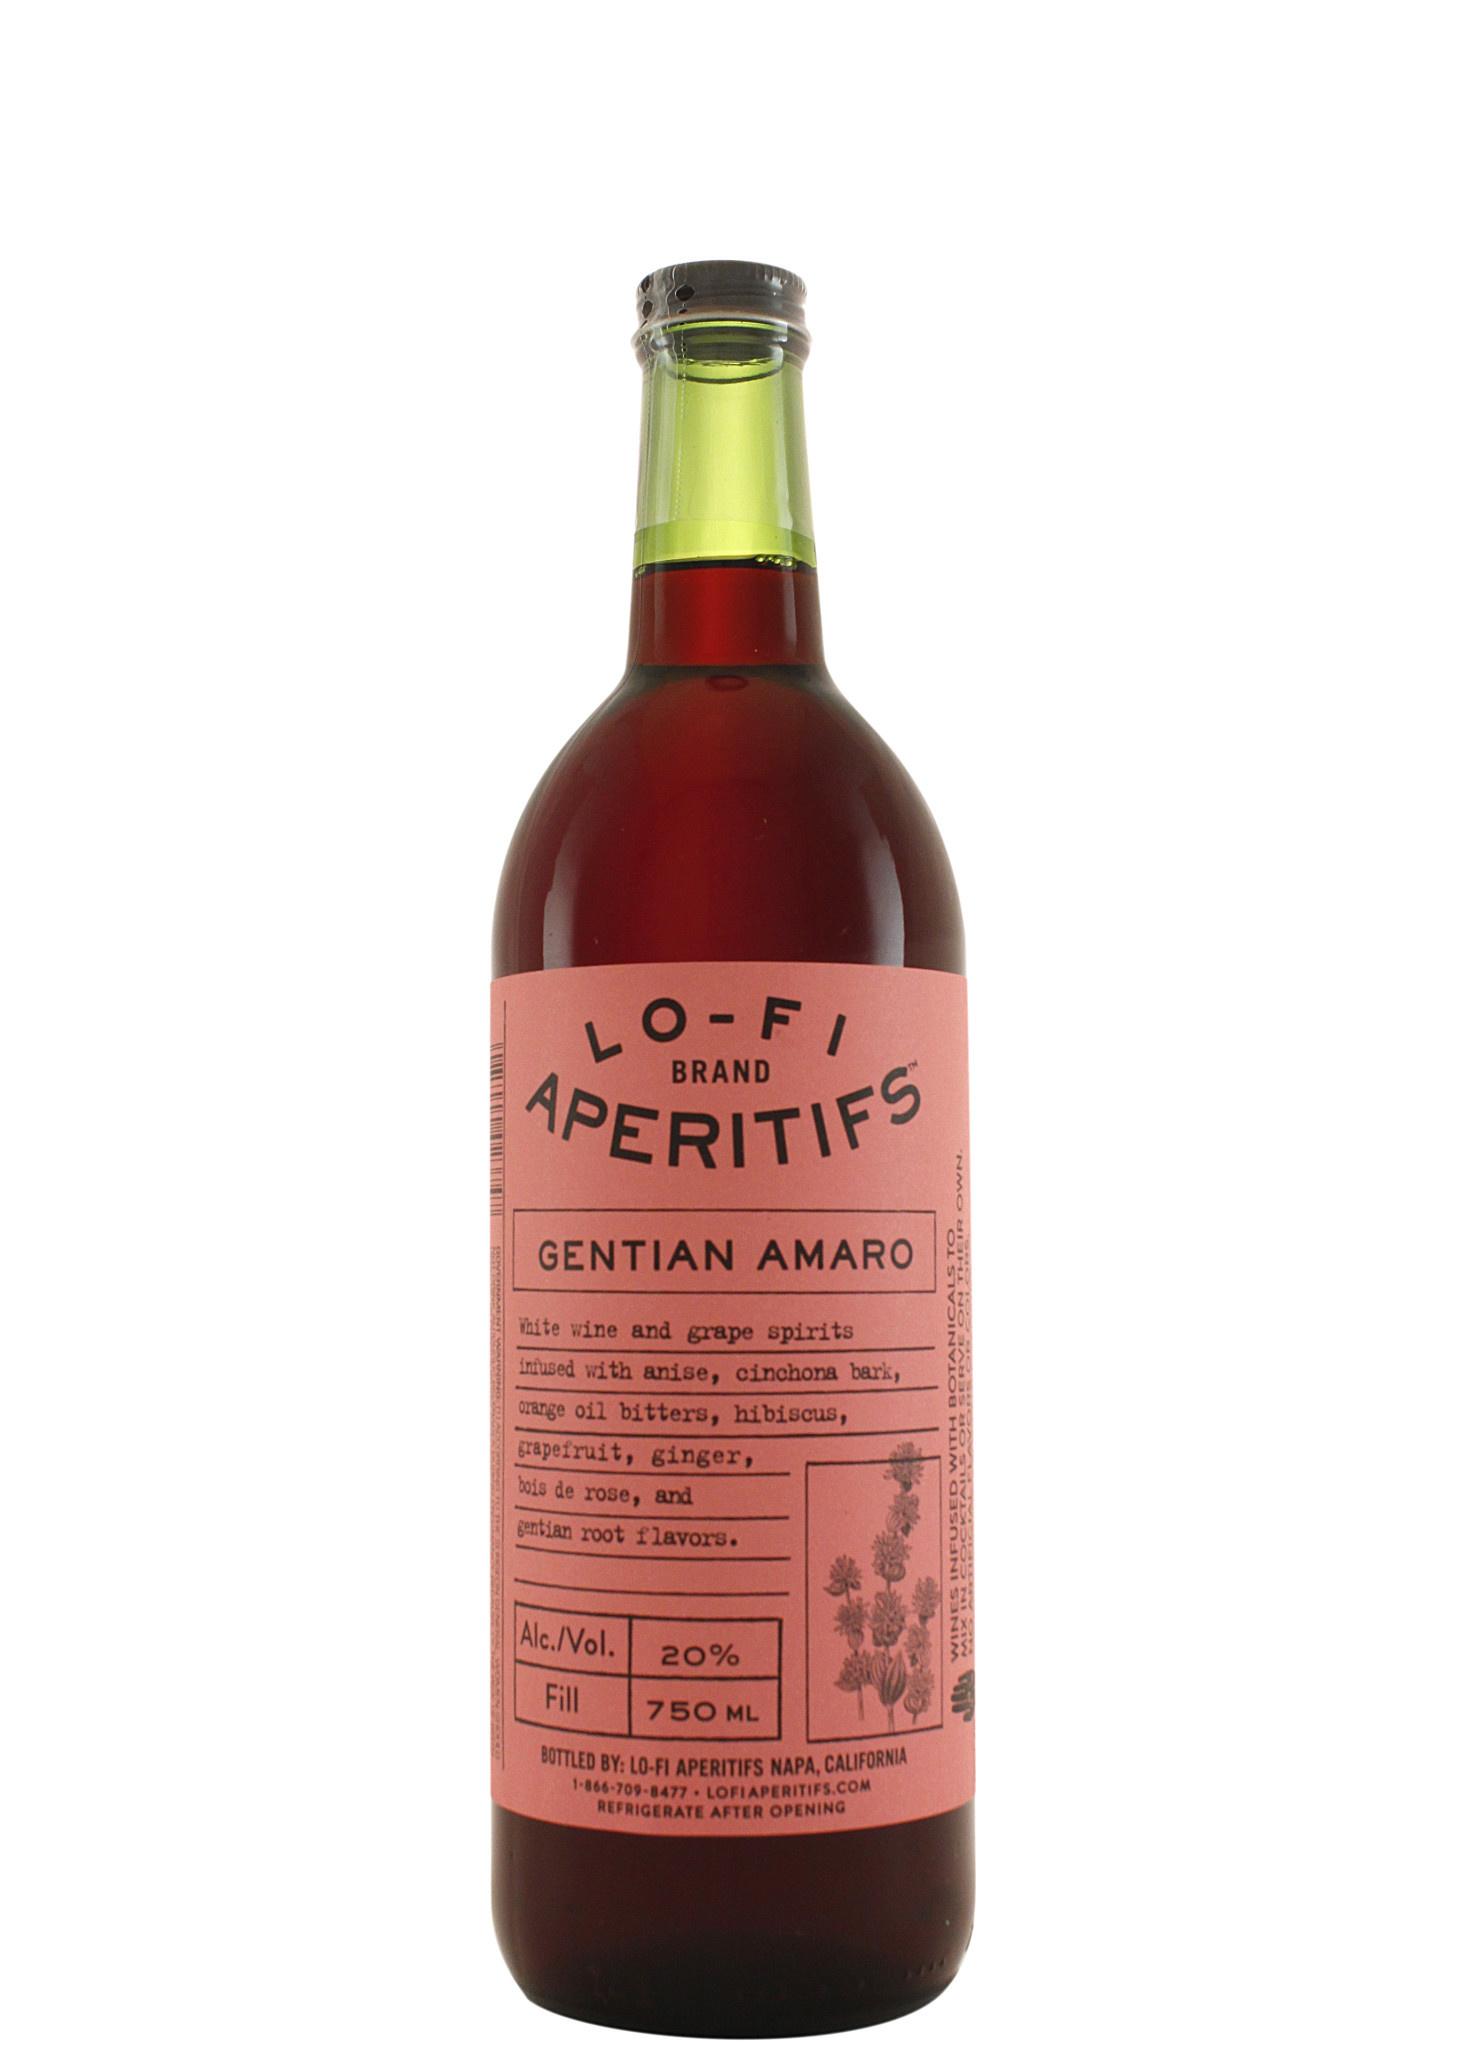 Lo-Fi Aperitifs Gentian Amaro Napa, California